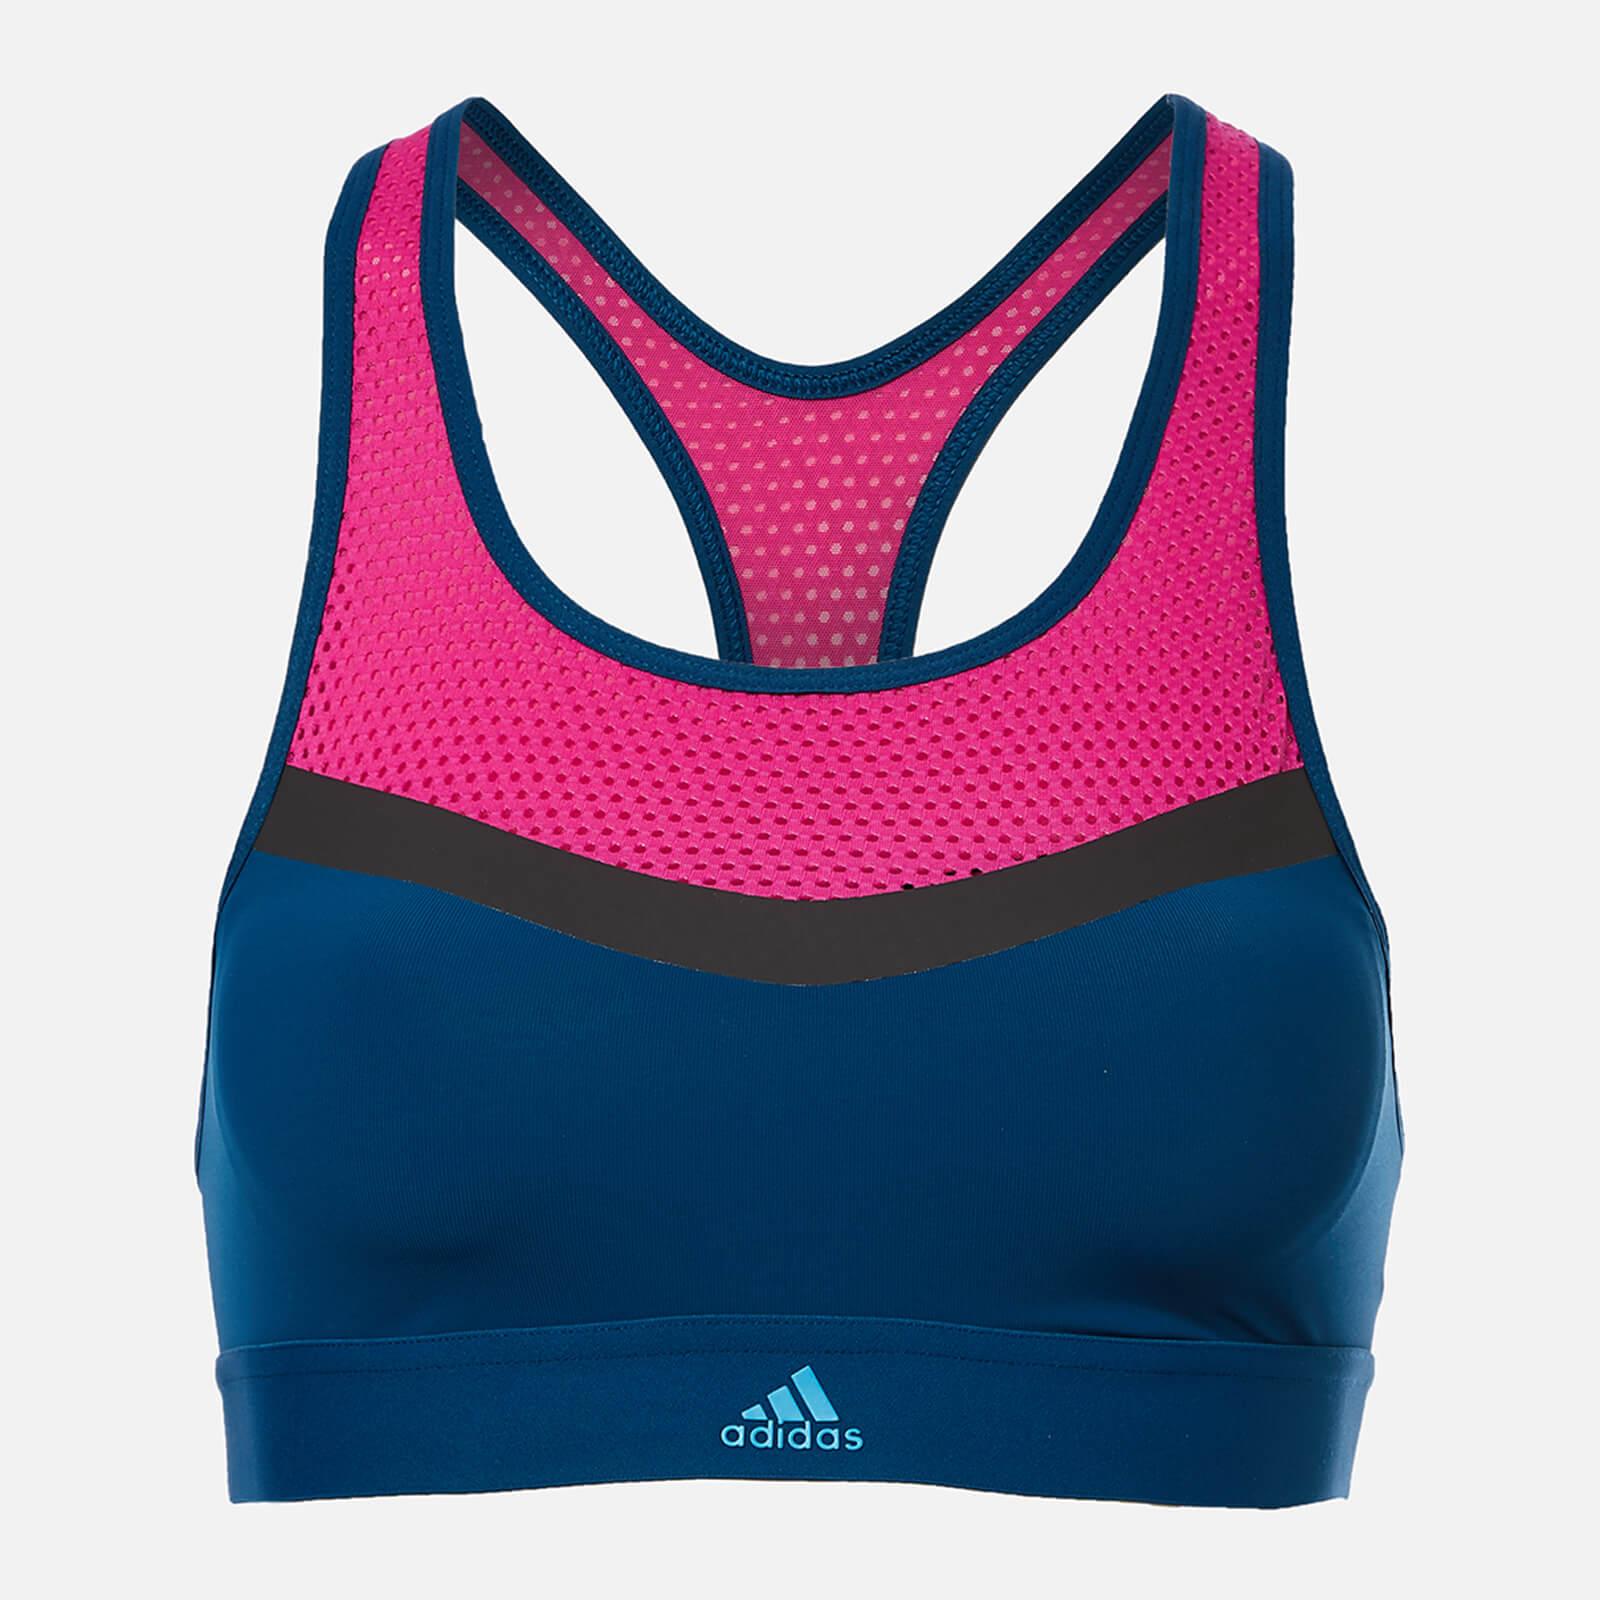 adidas Women's Don't Rest Swim Crop Top - Blue/Pink - 32B - Multi